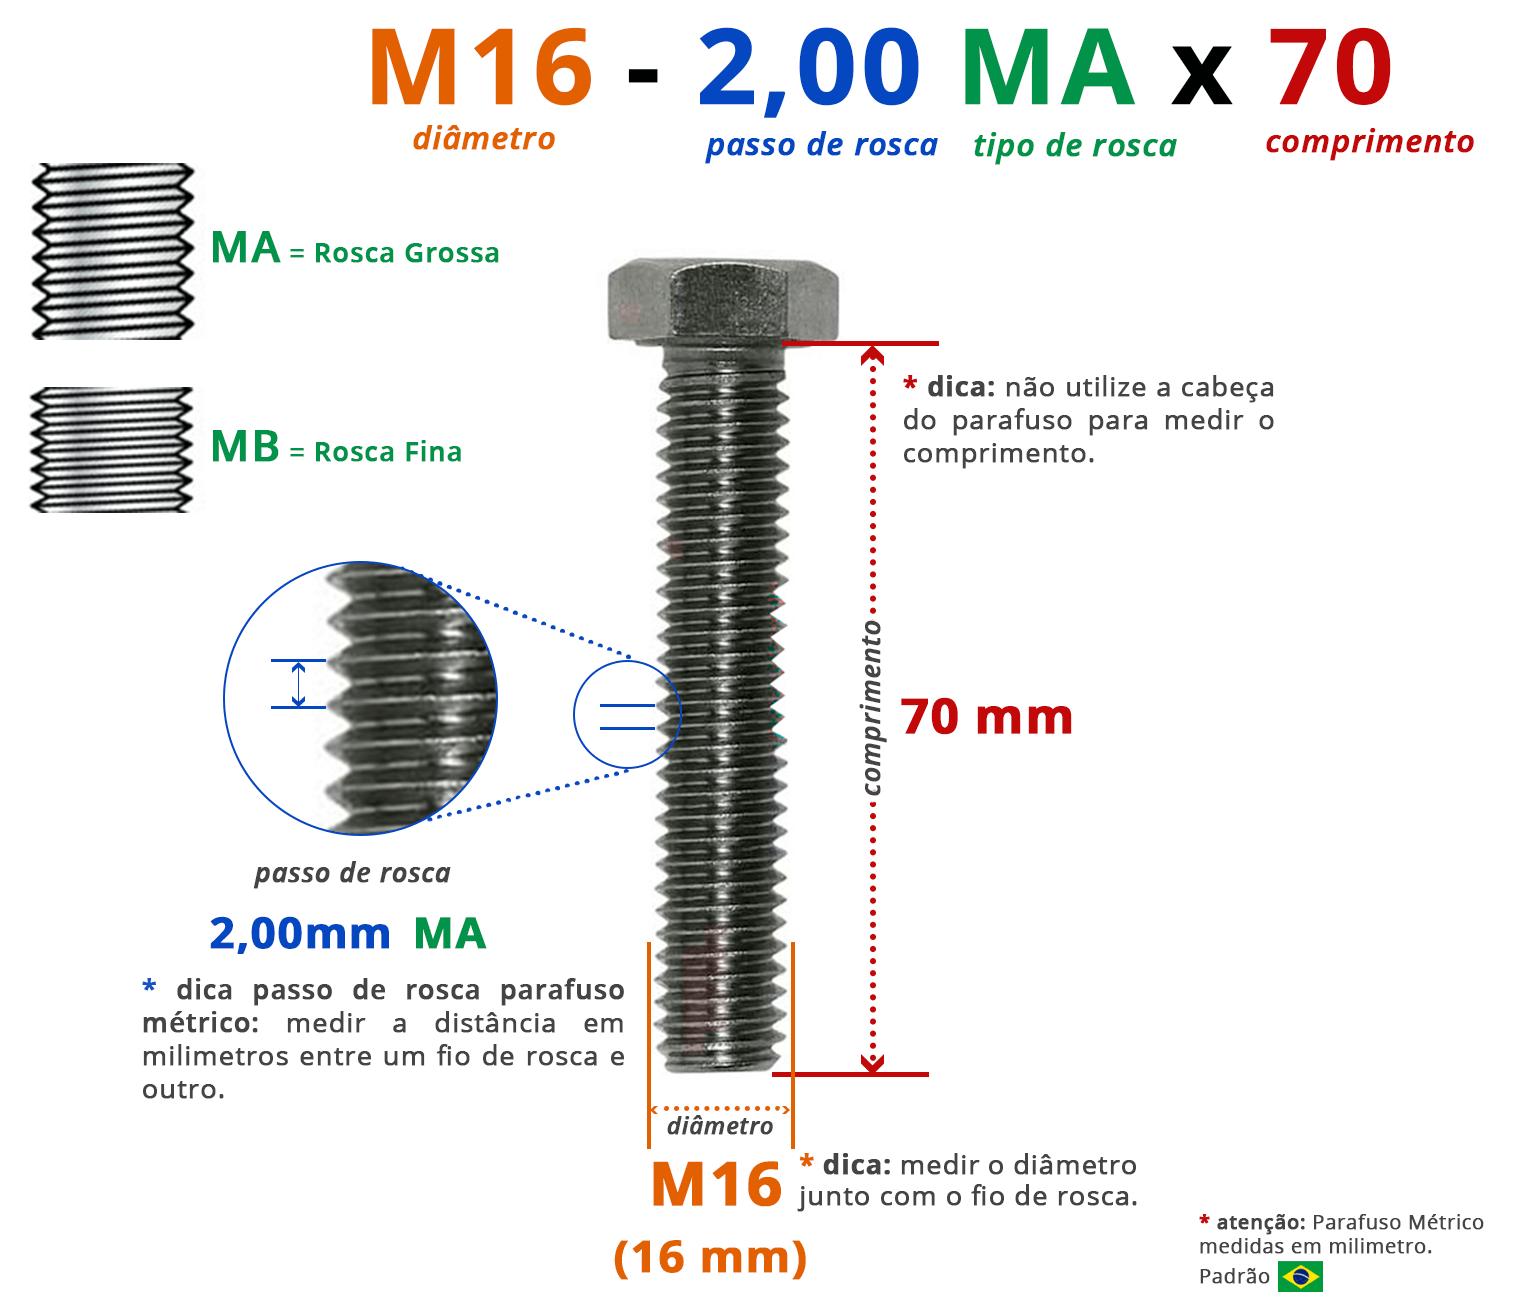 PARAFUSO SEXTAVADO ROSCA INTEIRA M16 2,00 MA X 70 DIN 933 INOX A4